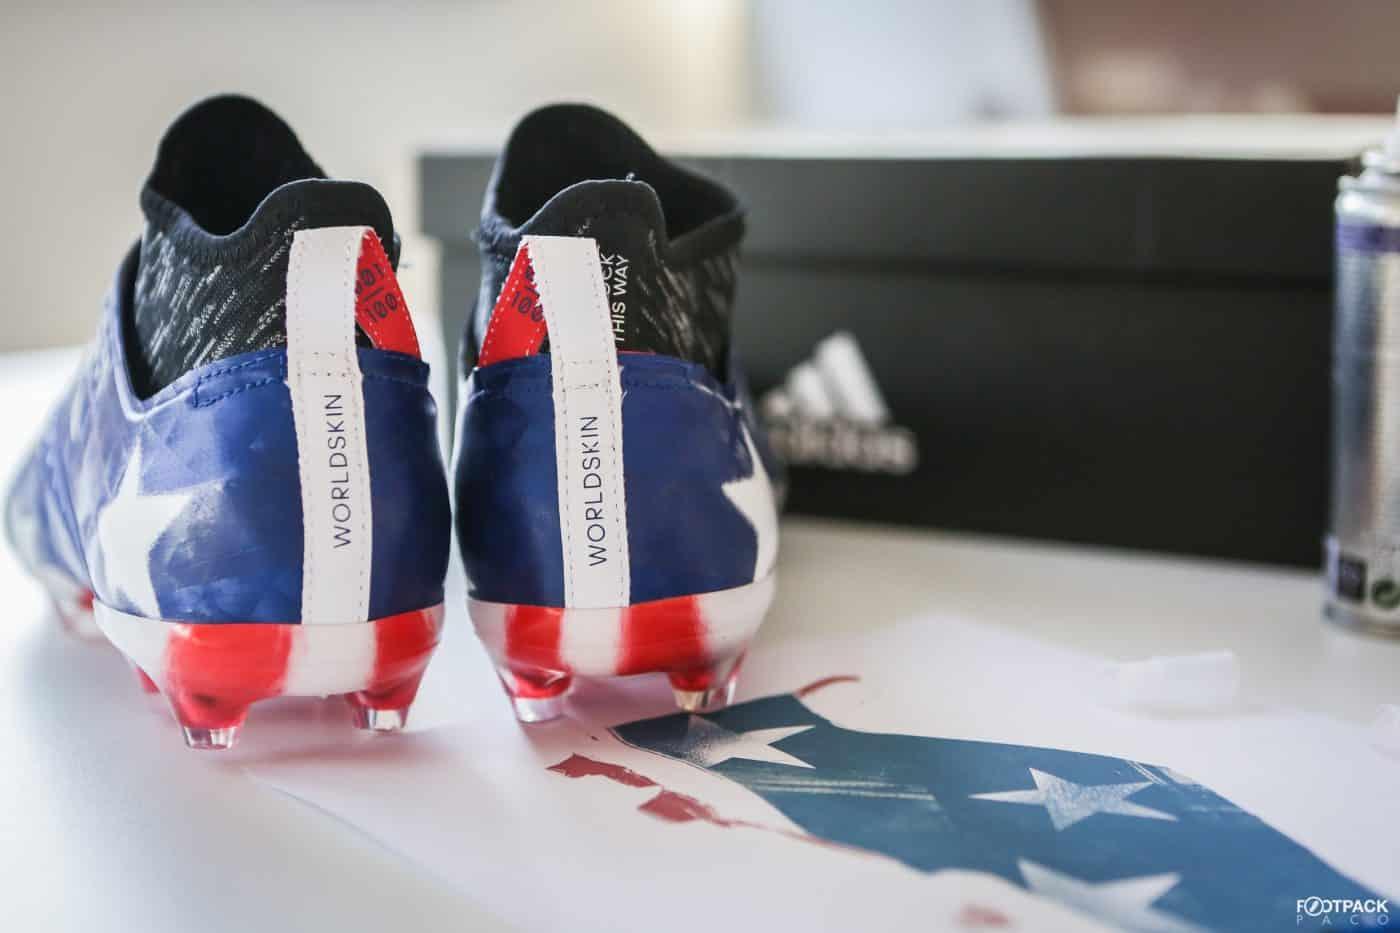 adidas-glitch-skin-worldskin-equipe-de-france-etoiles